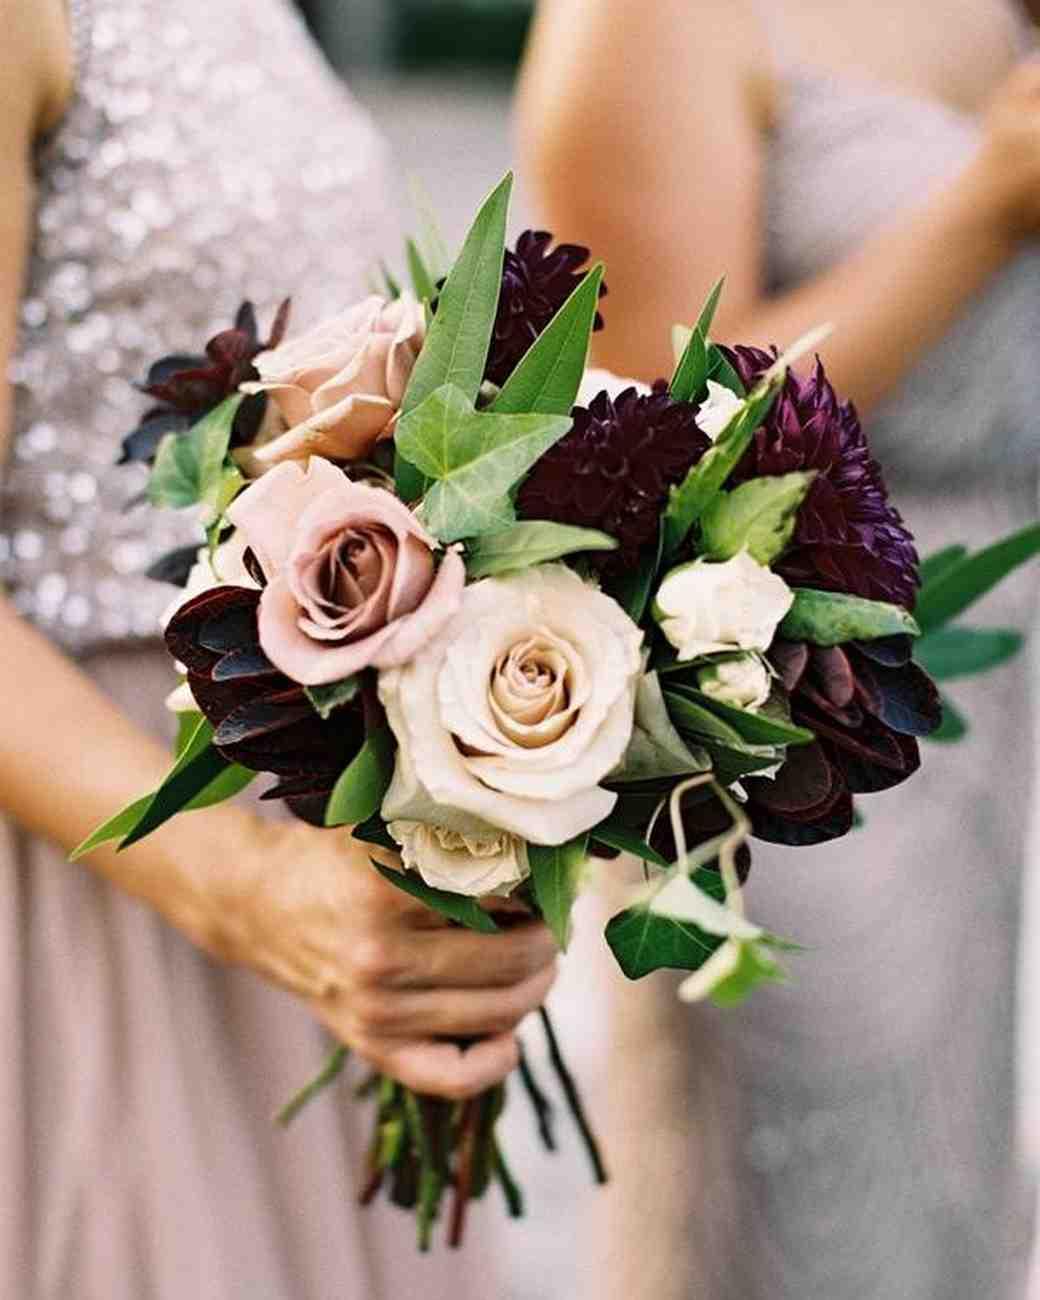 bridesmaid holding blush roses and dark purple dahlia bouquet